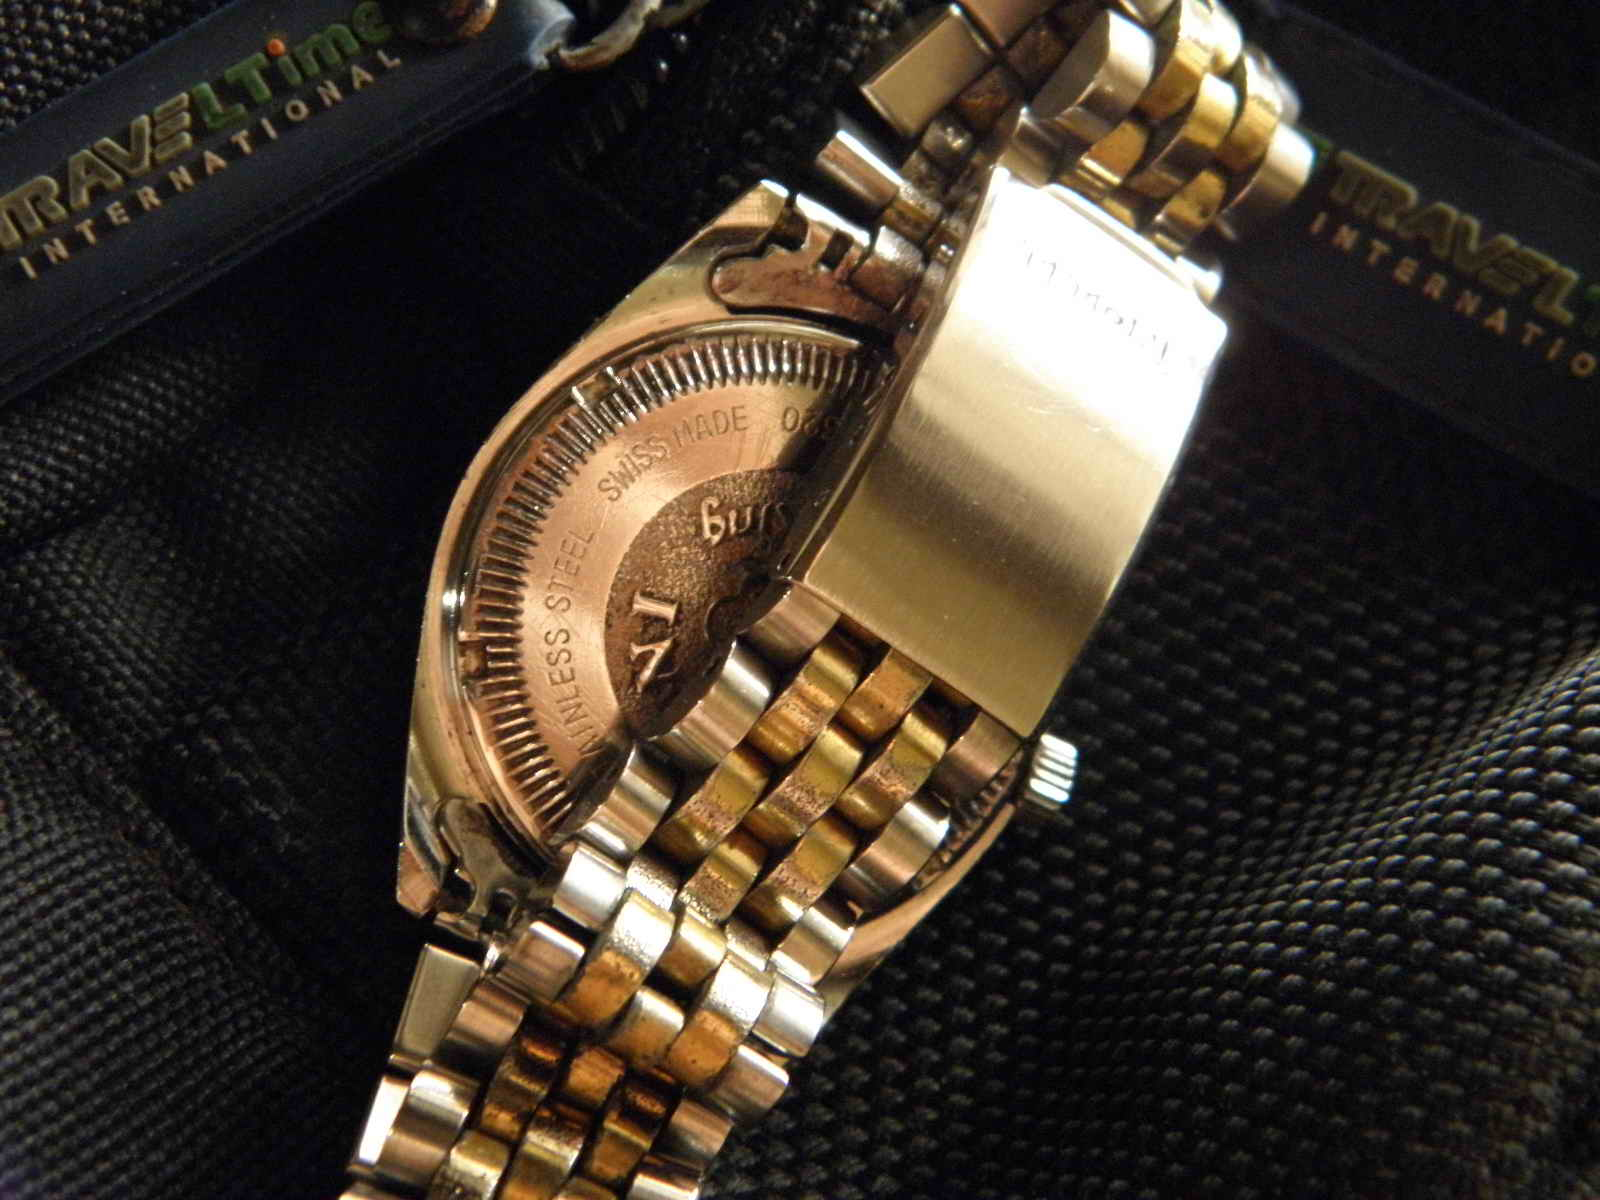 Kiosku Sold Titoni Cosmo King Boy Size Rolex Gmt Kombinasi Swiss Mesin 2838 2 Movement Automatic Made 25 Jewels Dia 33 Mm W C Dial Putih Dengan Index Diamond Sintetis Dan Angka Romawi Case Bracelet Two Tone